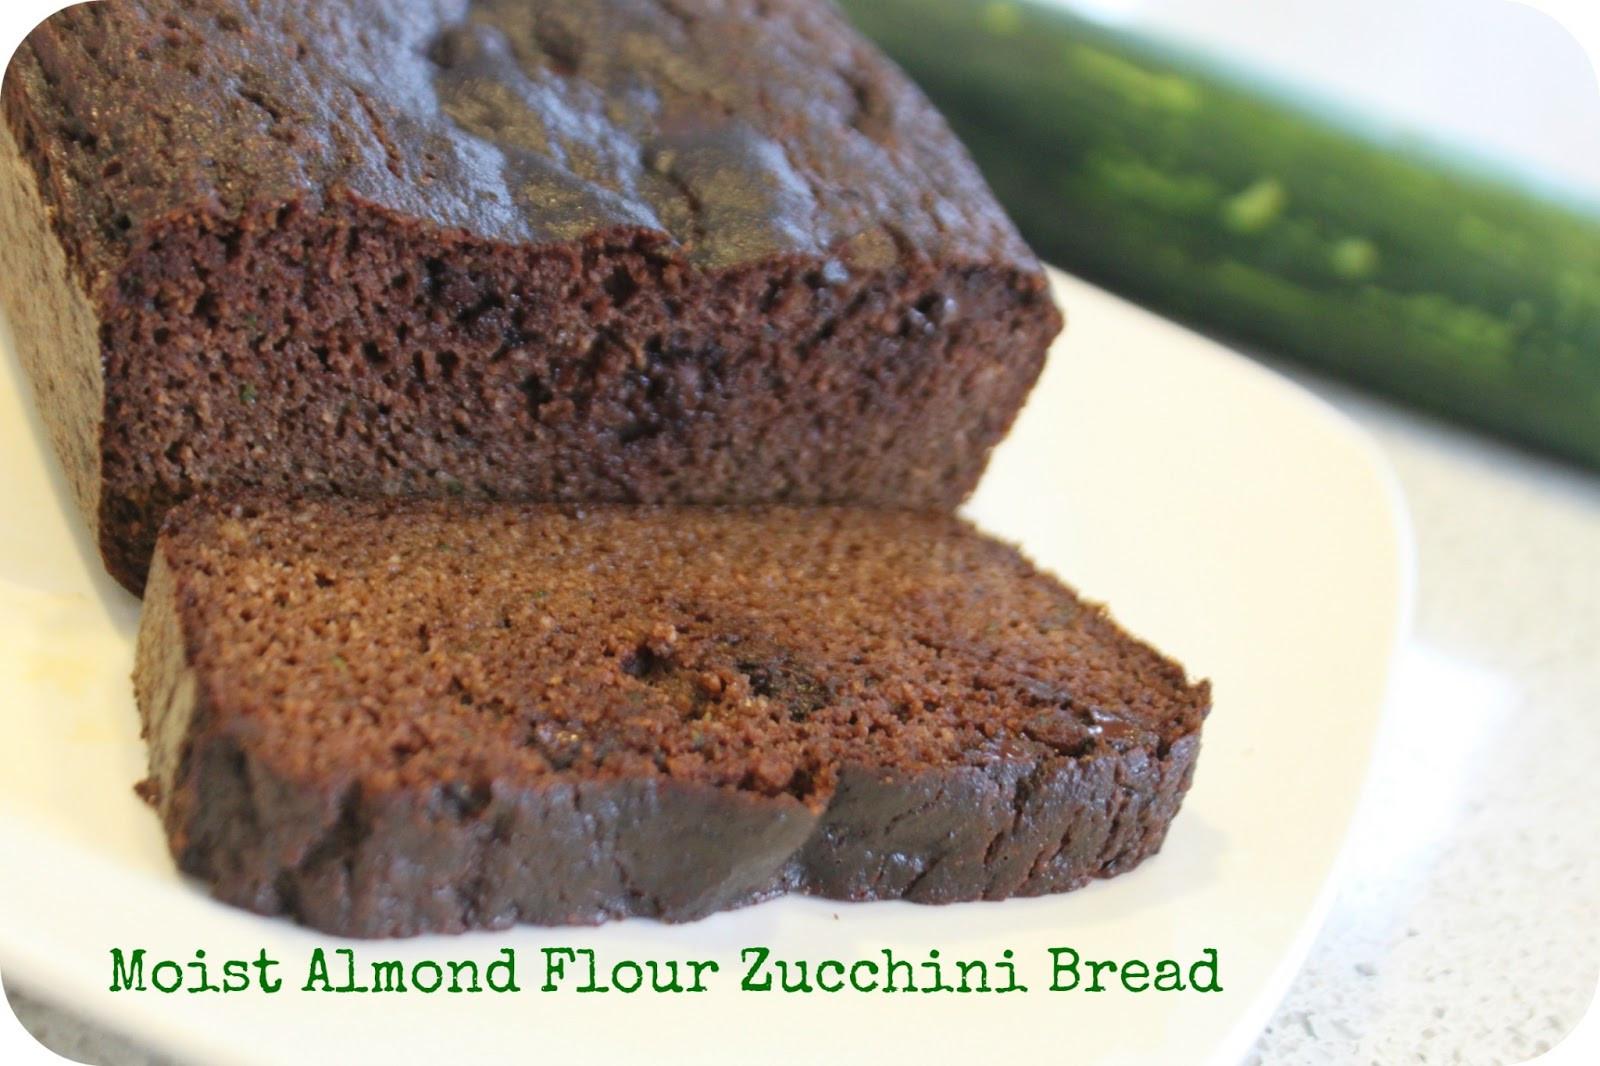 Almond Flour Zucchini Bread  MamaEatsClean Paleo Dark Chocolate Zucchini Bread made